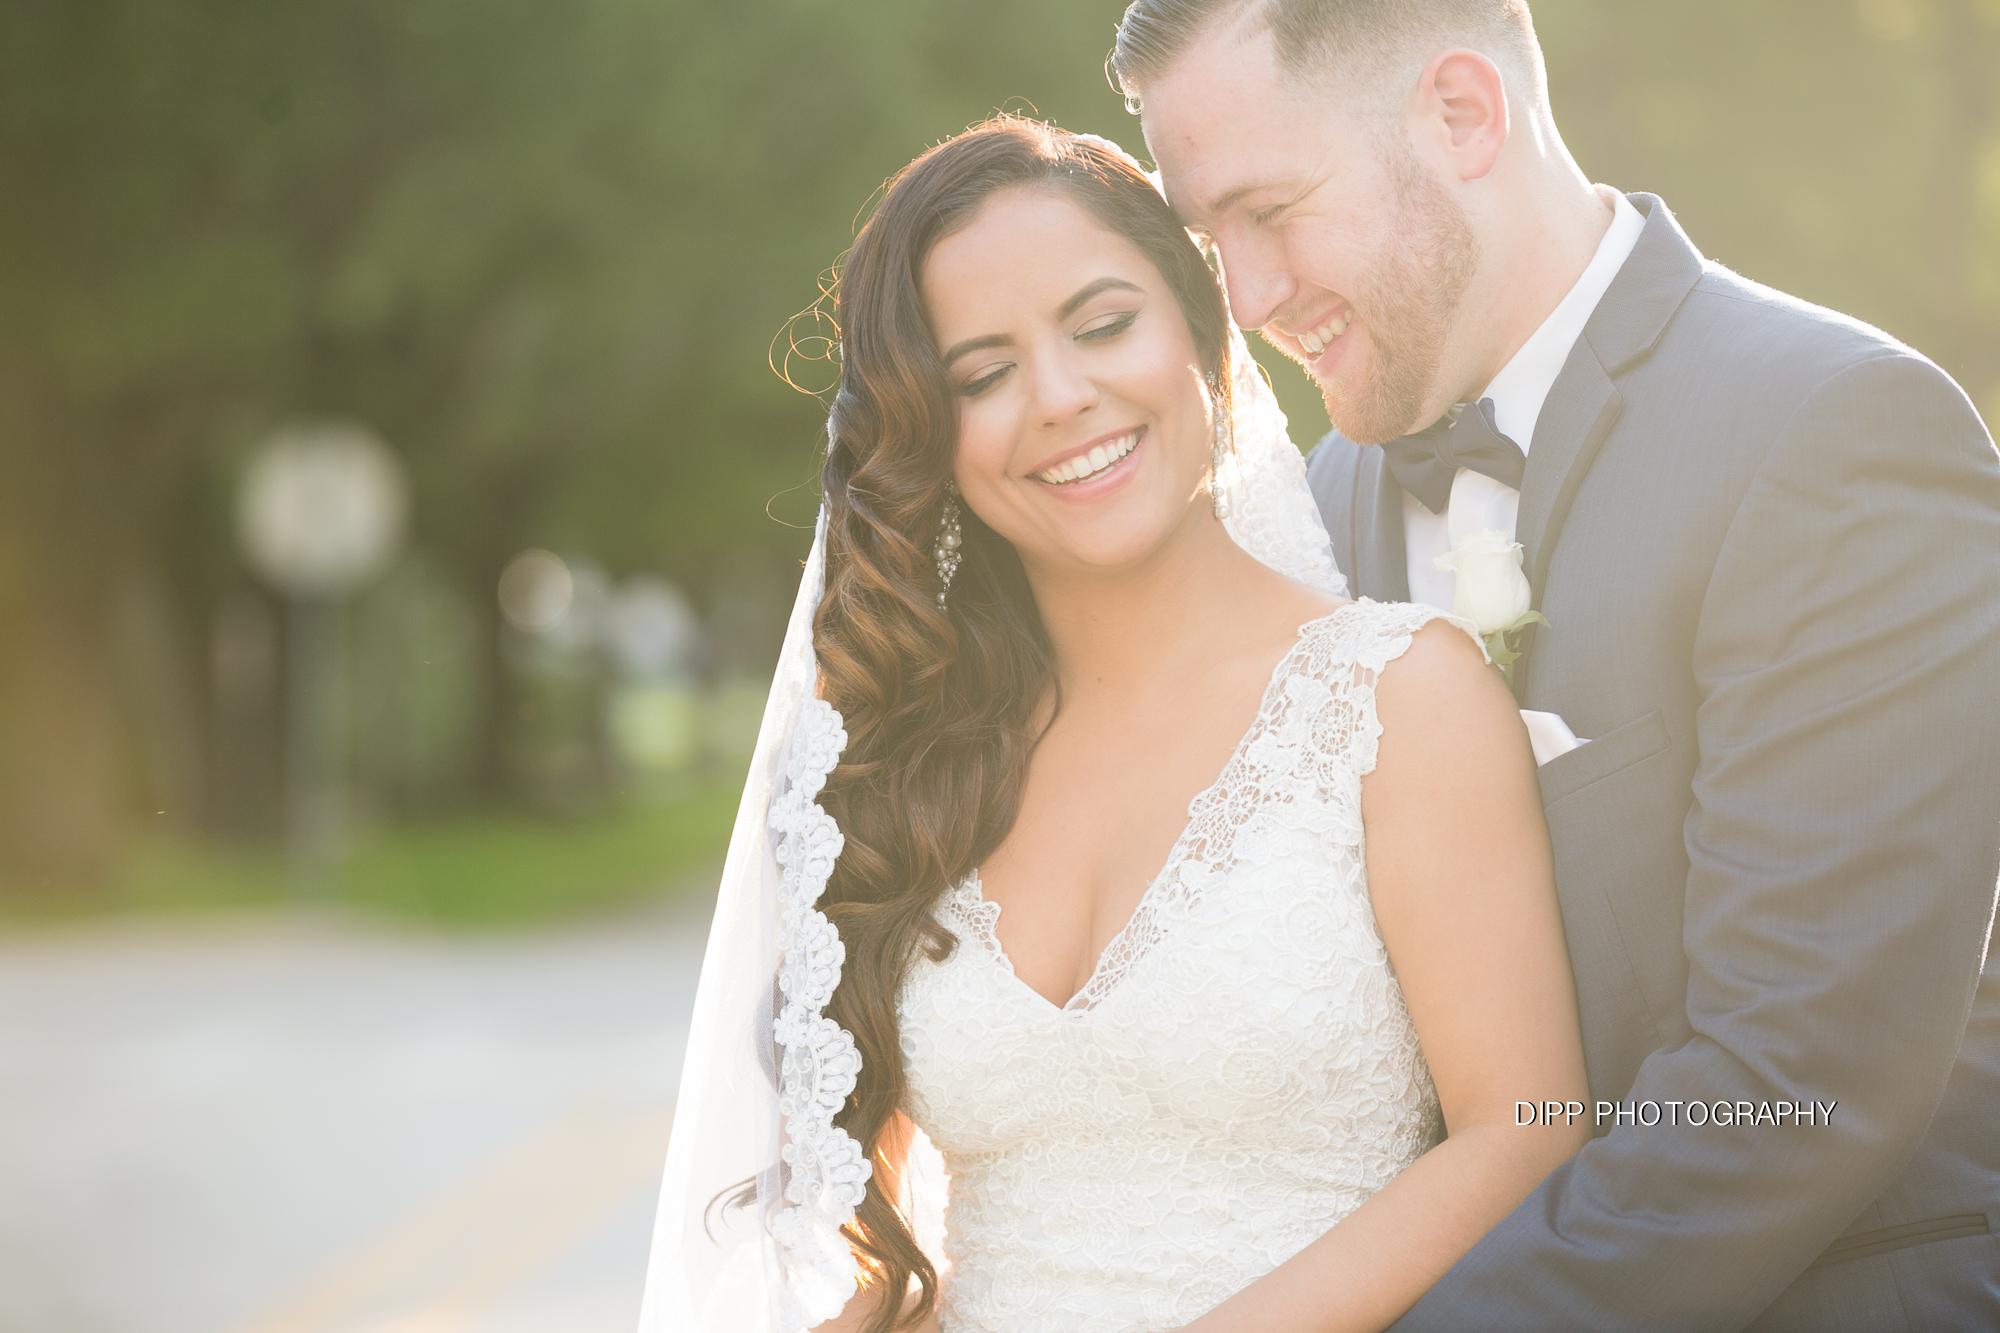 Dipp_2016 EDITED Melissa & Avilio Wedding-320